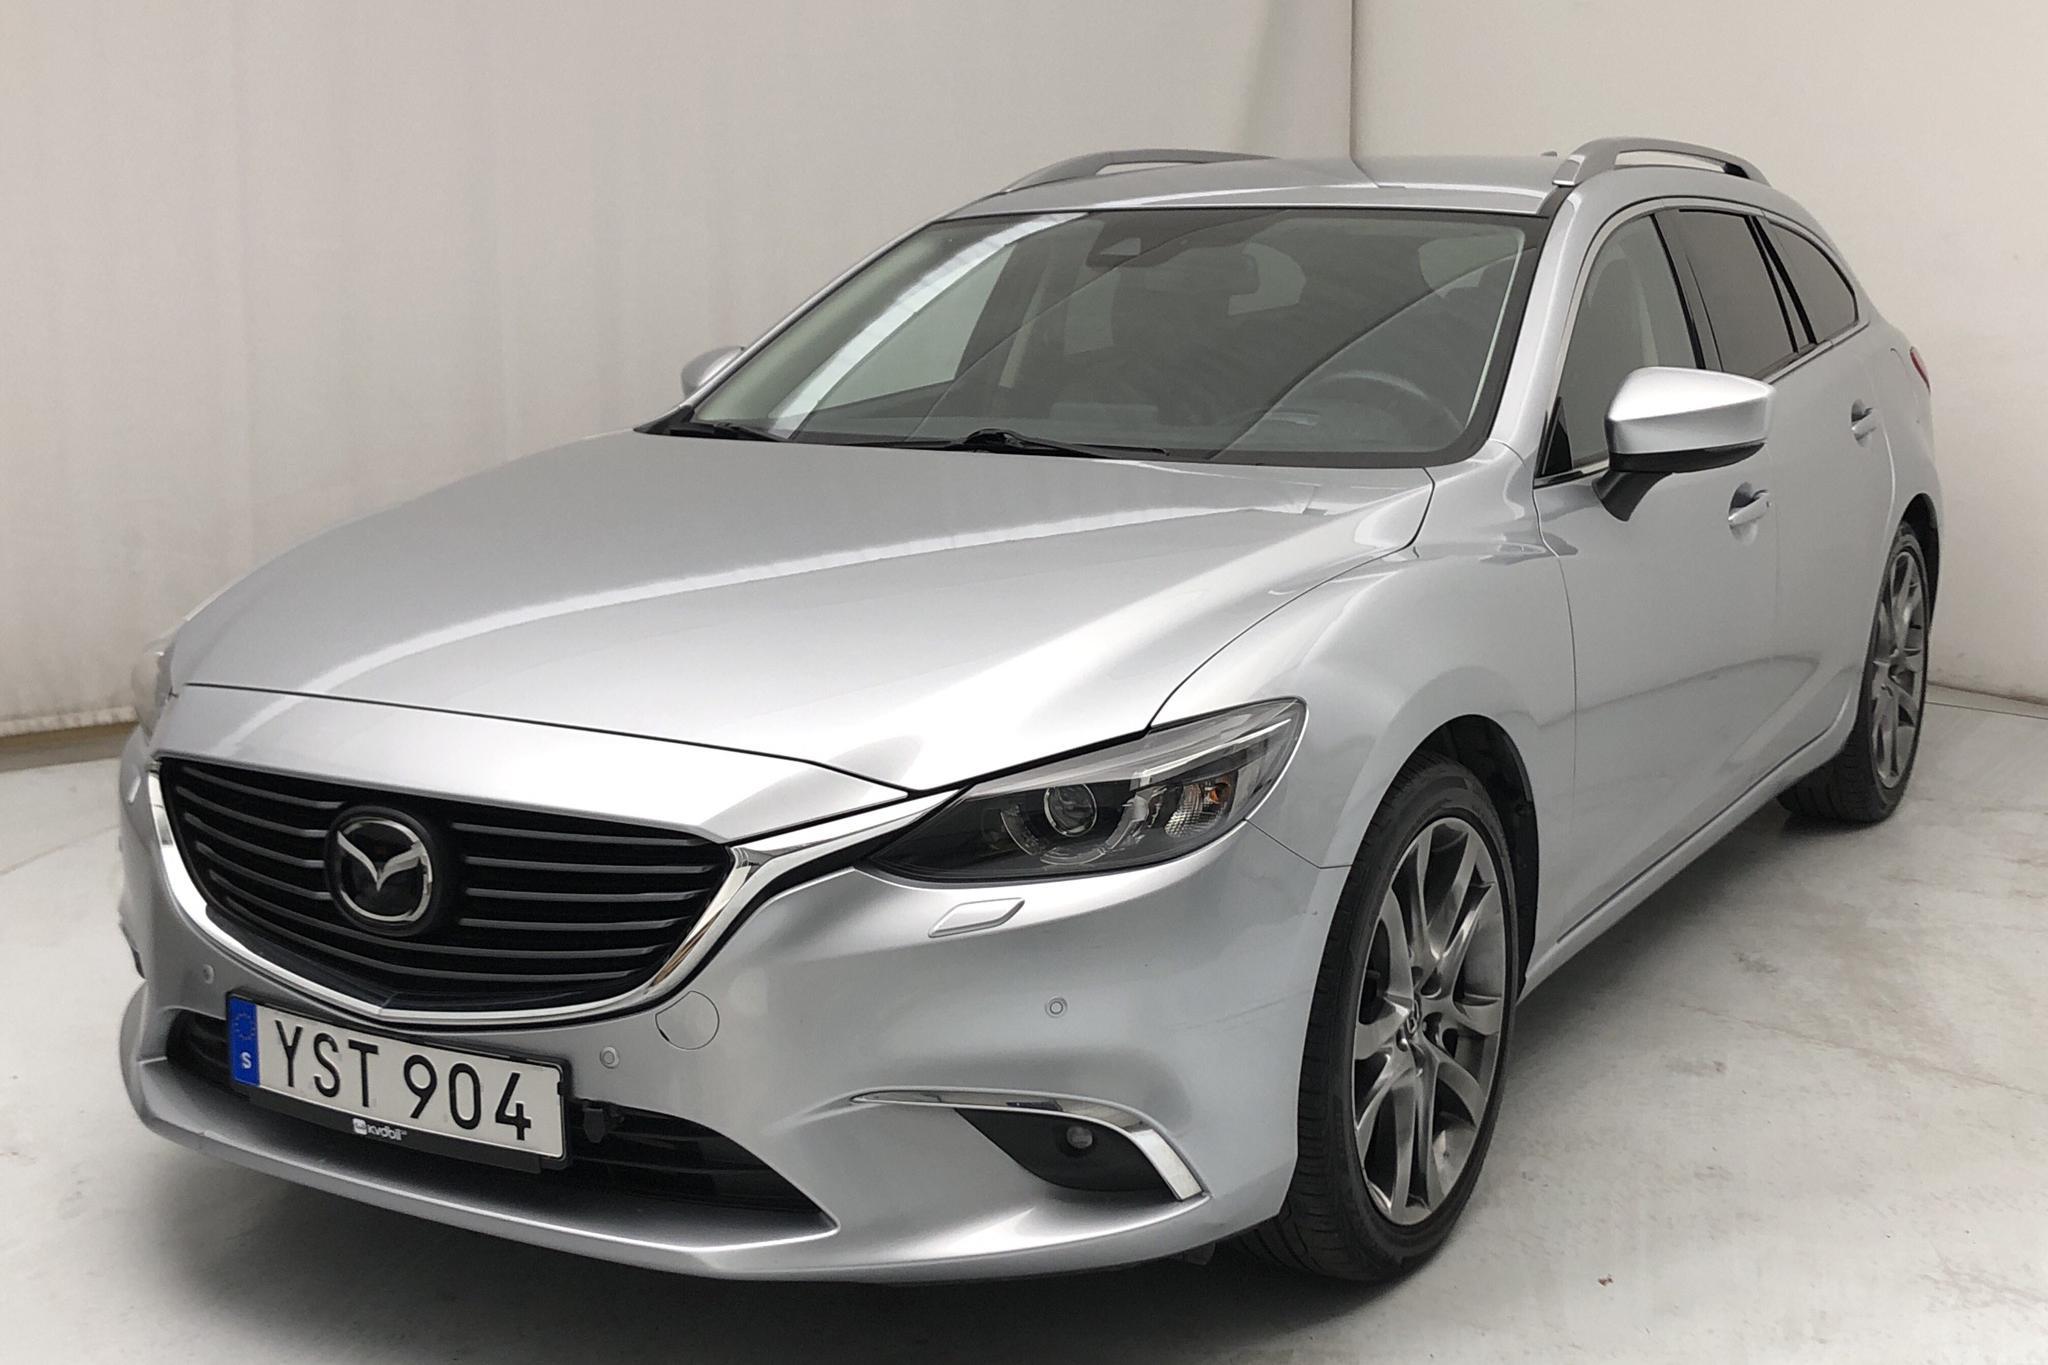 Mazda 6 2.2 DE Kombi AWD (175hk) - 42 520 km - Automatic - gray - 2017